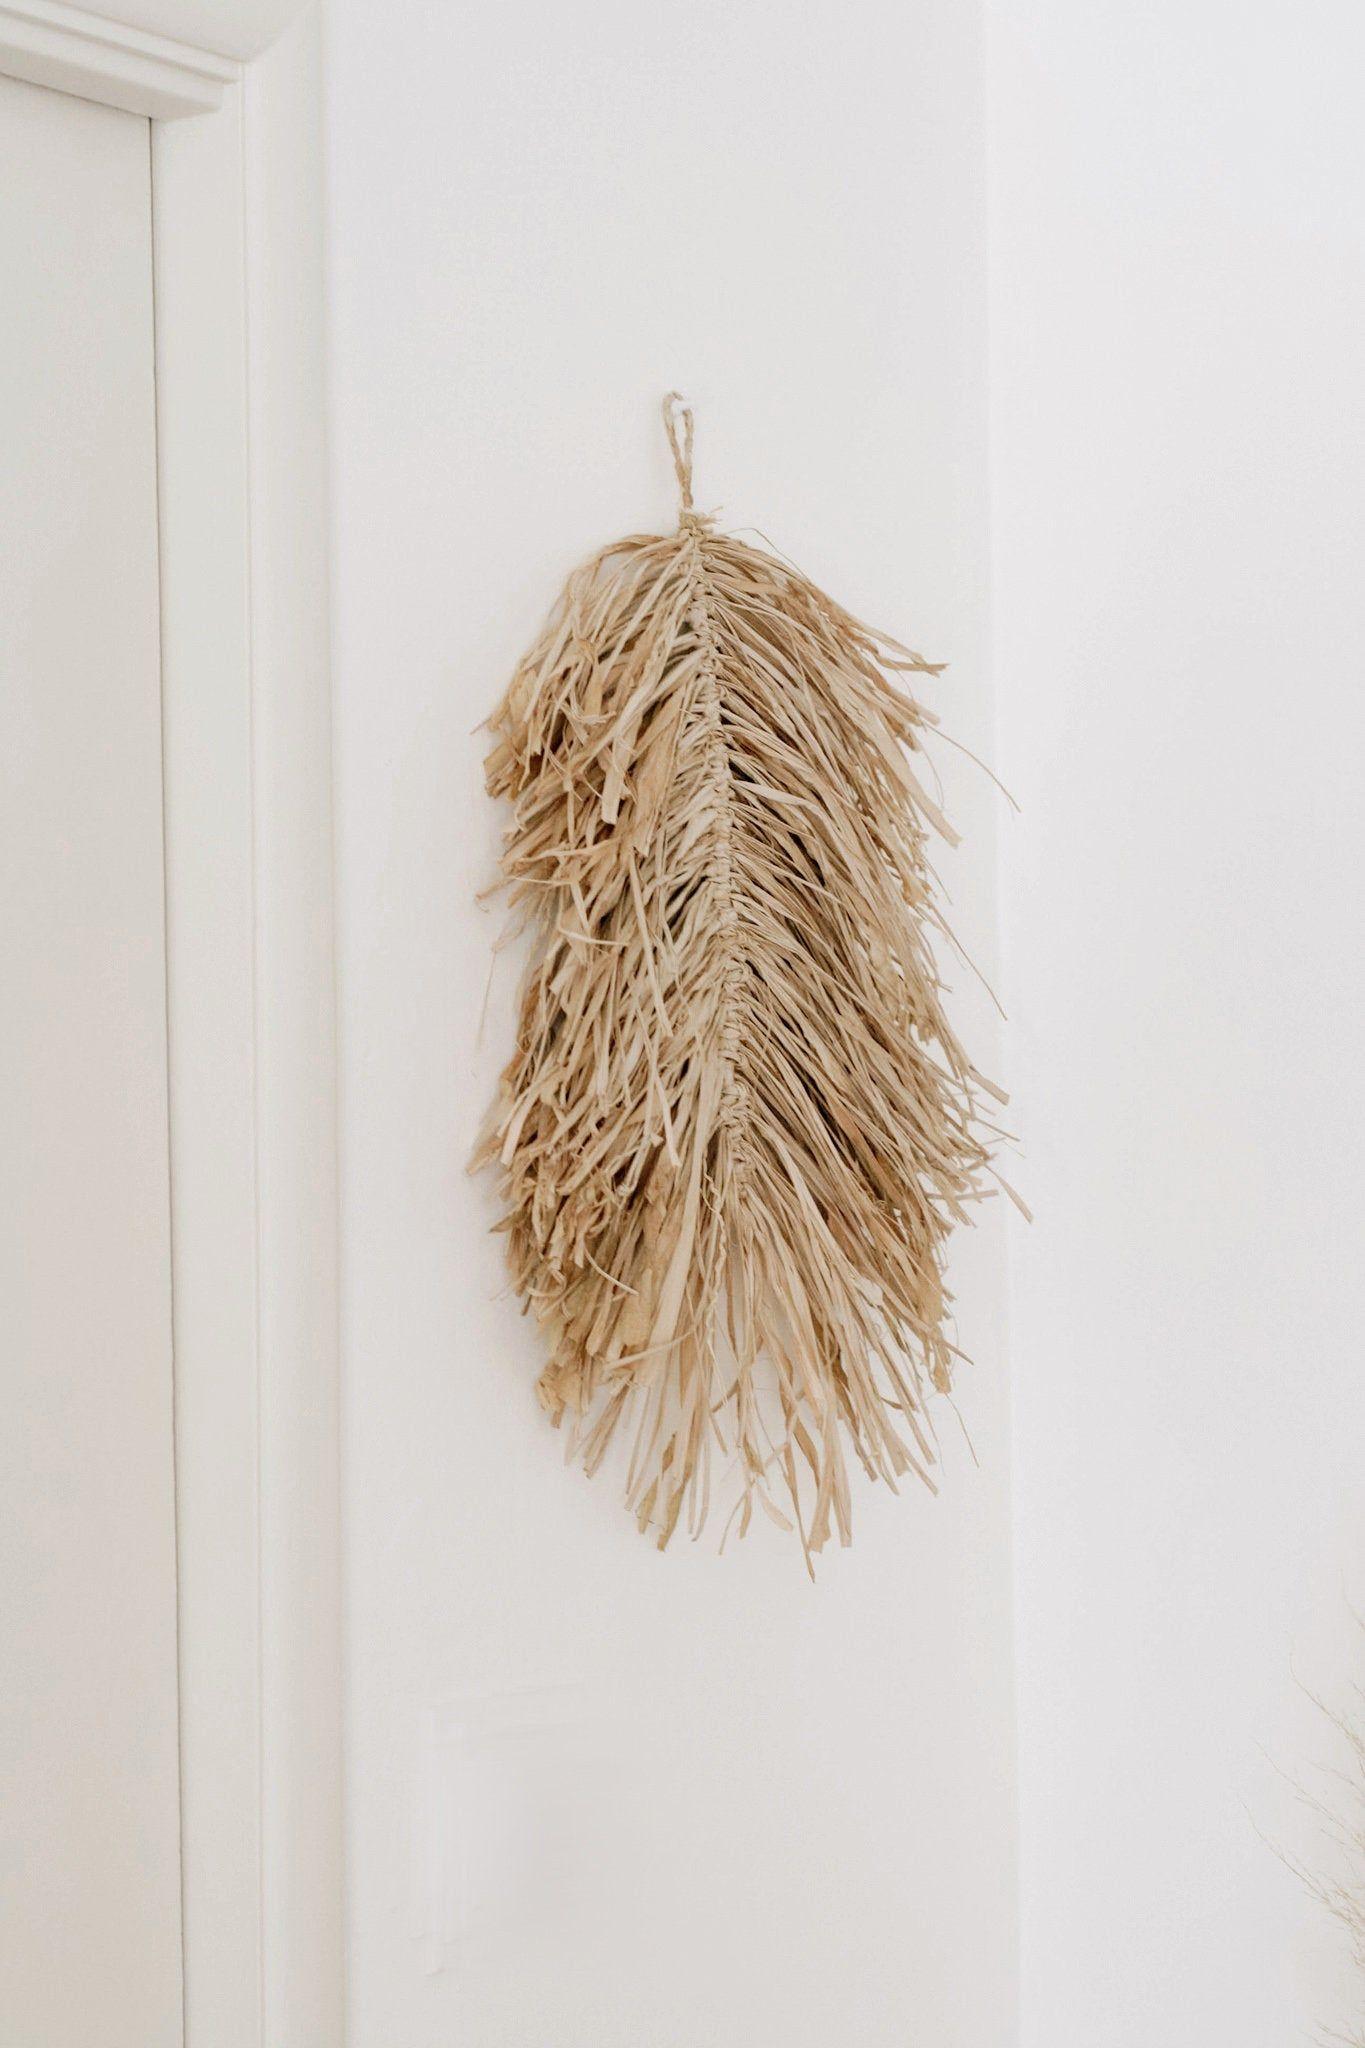 Handmade Natural Raffia Leaf Macrame Wall Hanging Grass Feather